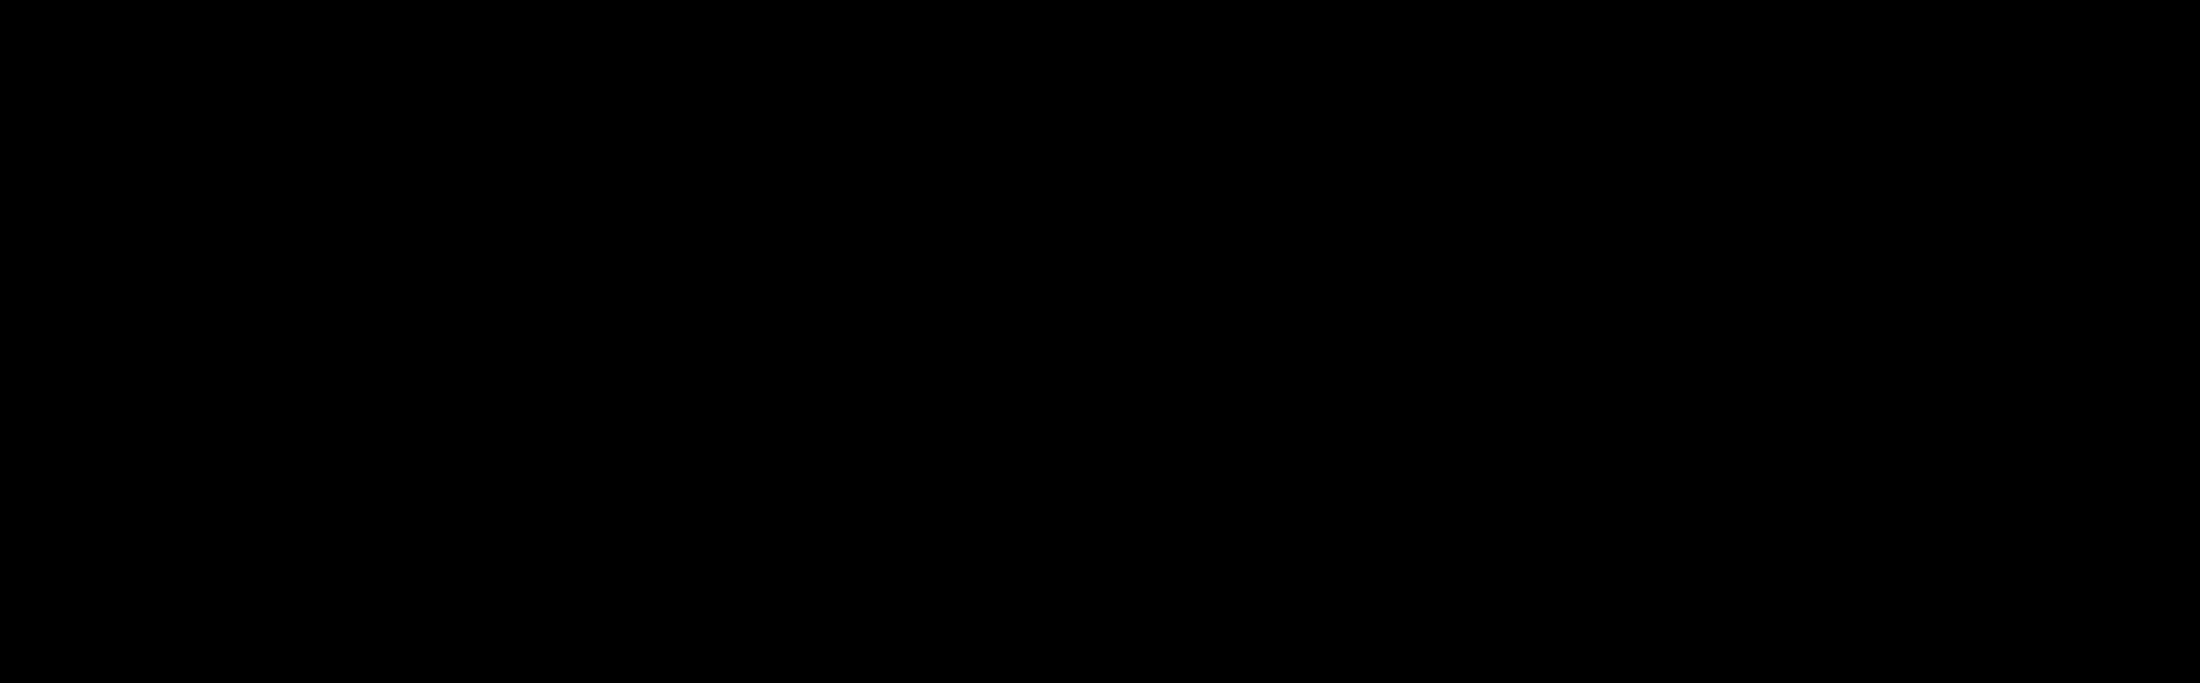 PaleyCenter-Lockup-Stacked-blk.png